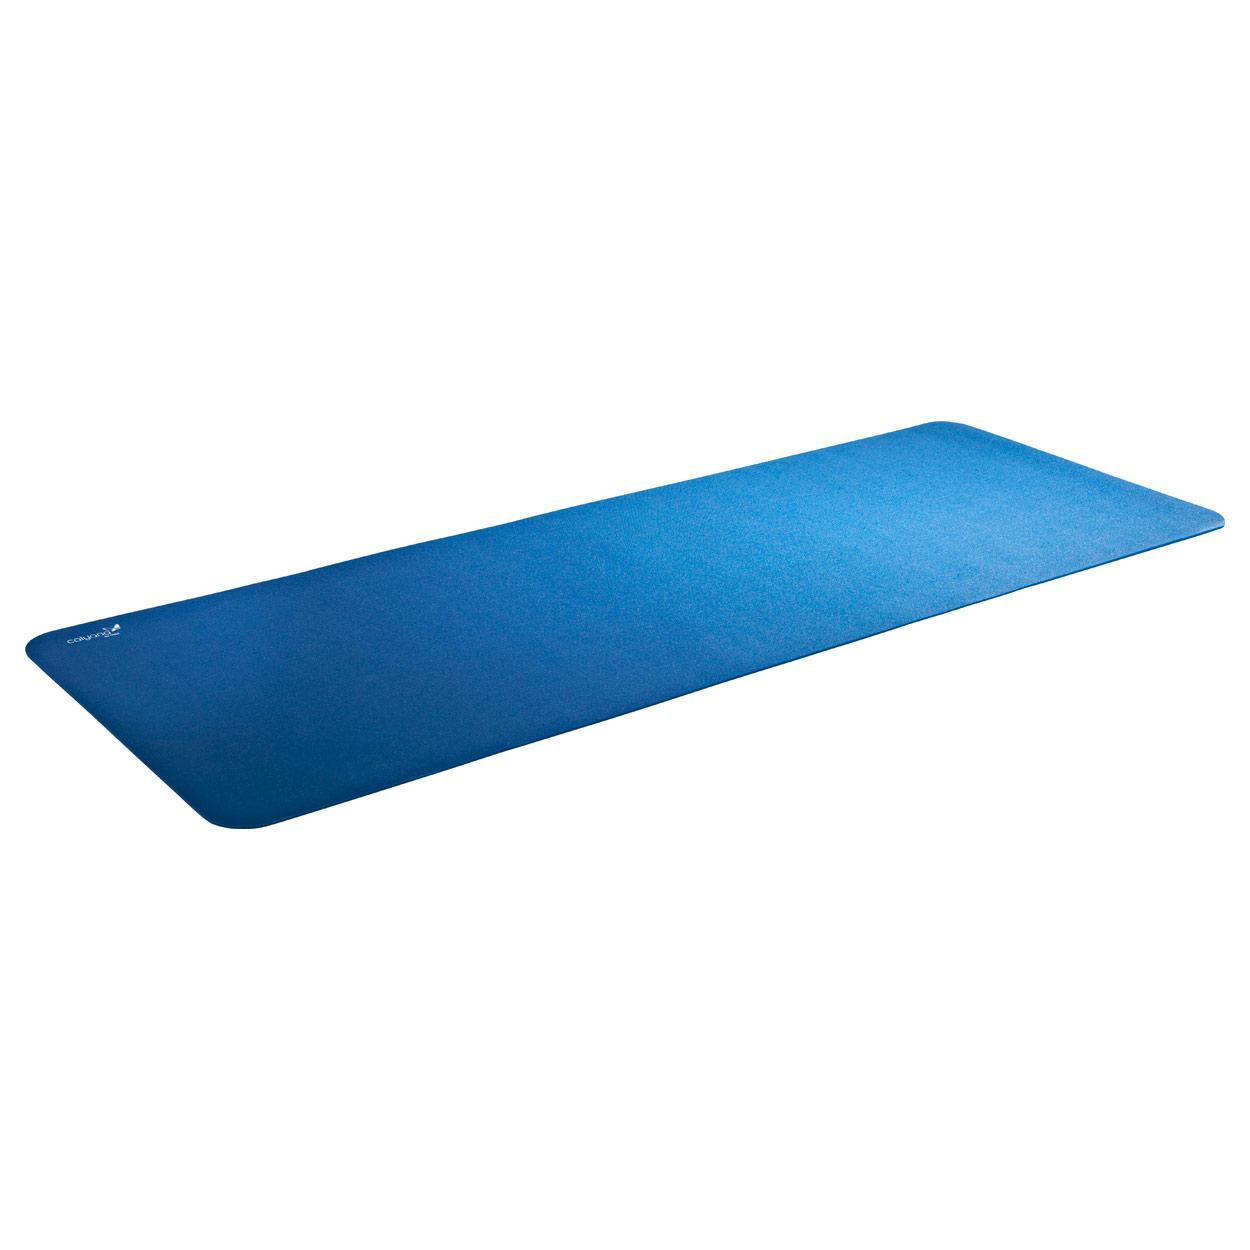 AIREX CALYANA Prime Sportmatte, Sportmatte, Sportmatte, Pilatesmatte, Turnmatte, Fitnessmatte, Blau deba5b